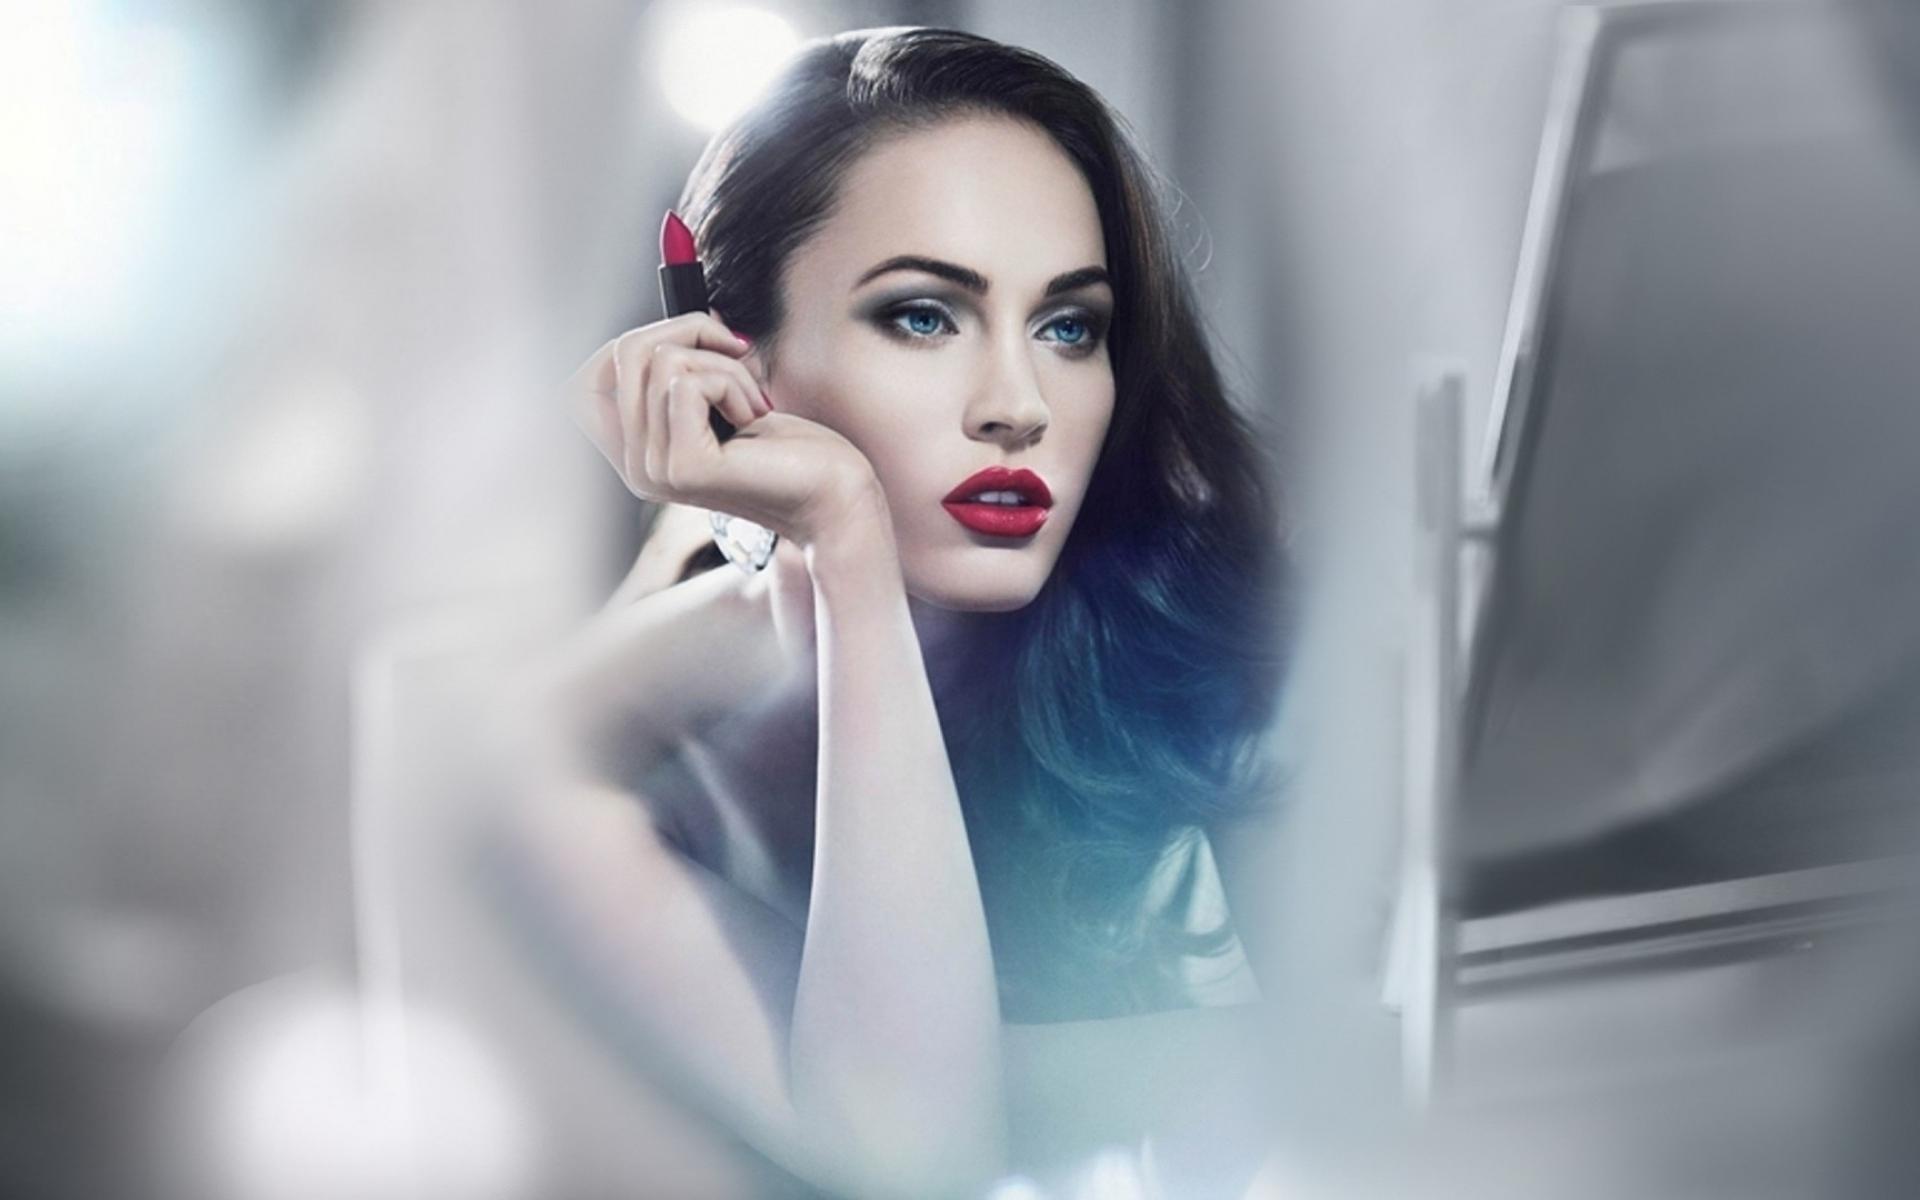 Картинки Меган фокс, лицо, помада, макияж фото и обои на рабочий стол